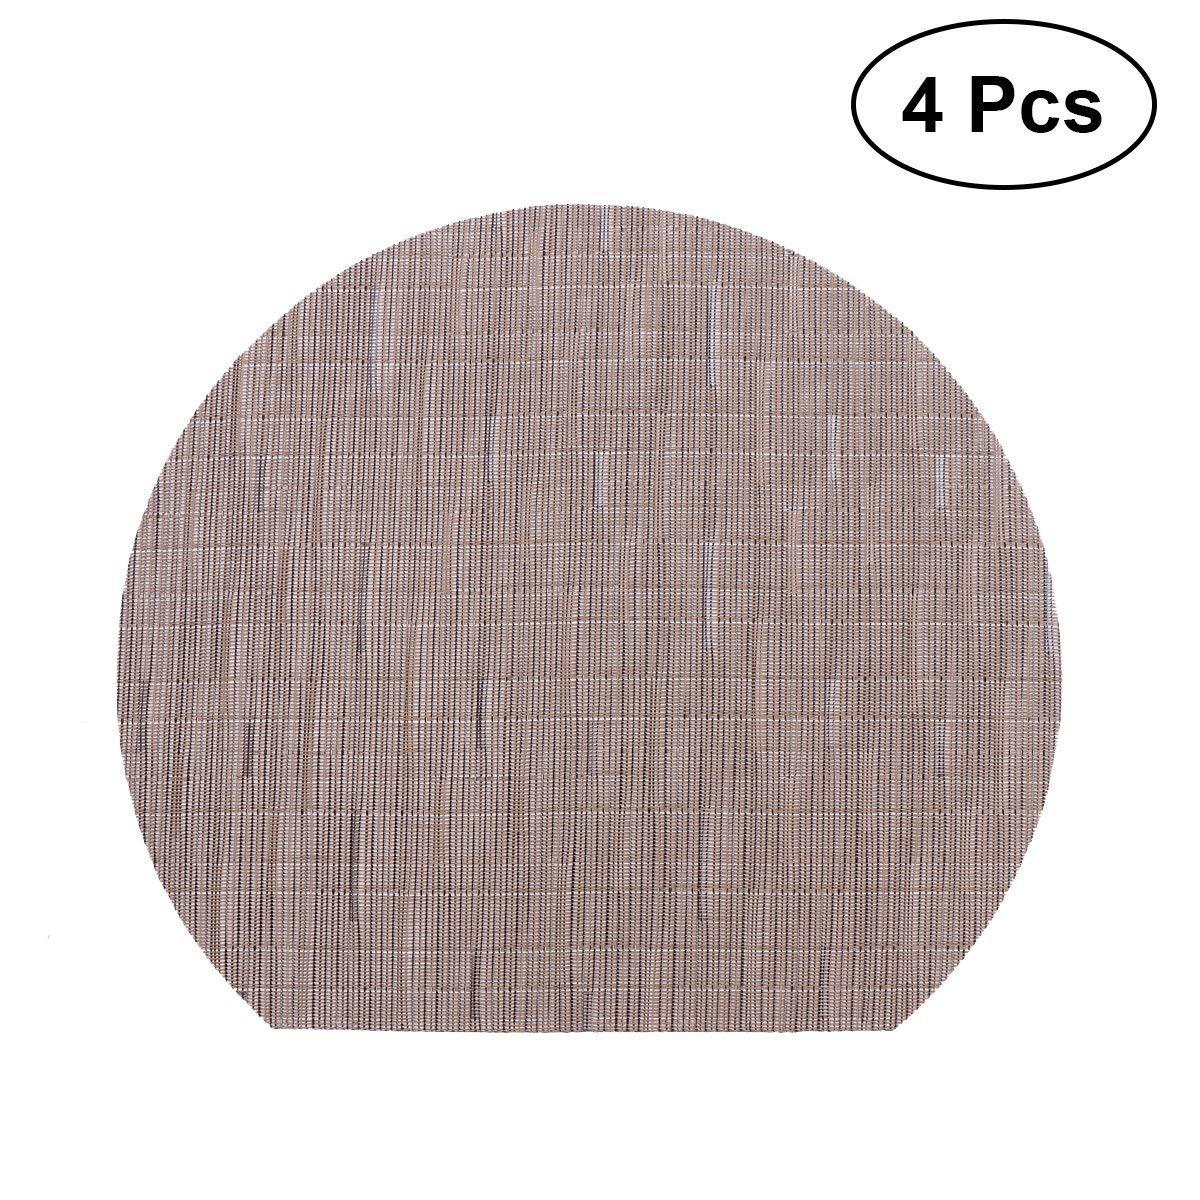 Get Quotations Bestonzon 4pcs Table Place Mats Heat Resistant Non Slip Tableware Coasters Pads